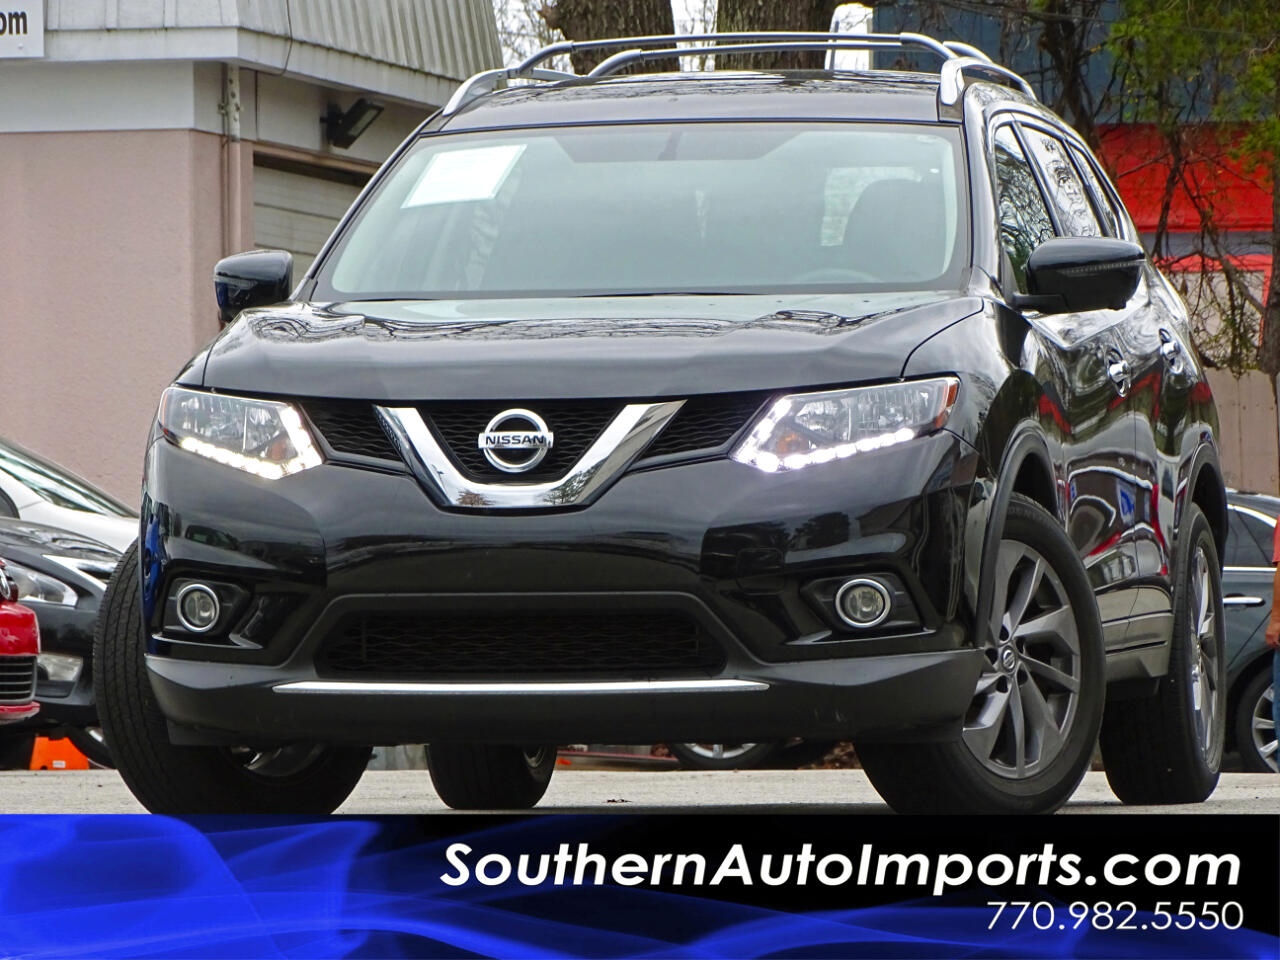 2016 Nissan Rogue SL w/Navigation 360 Camera